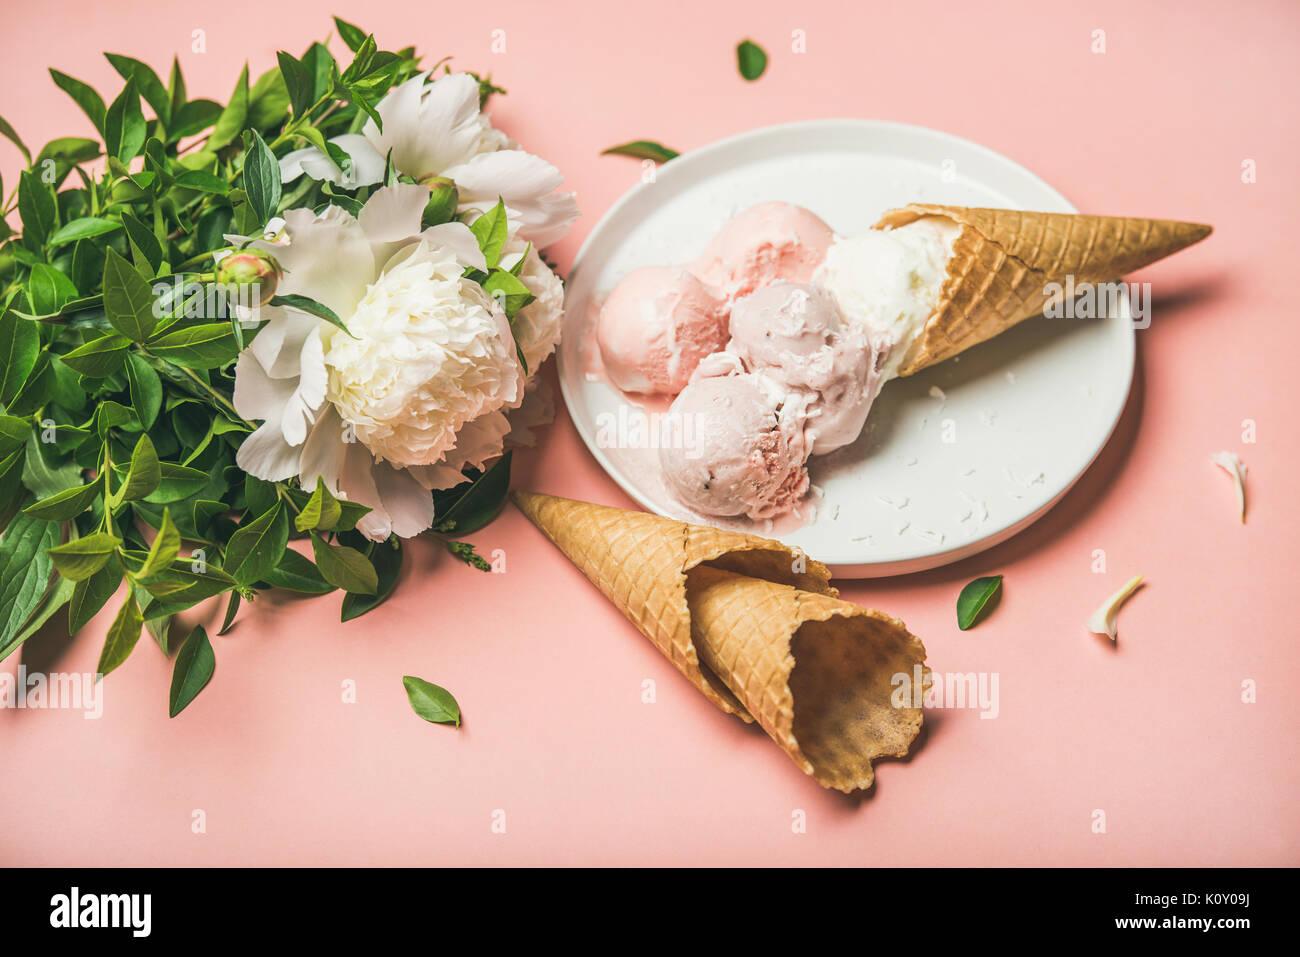 Strawberry and coconut ice cream, cones, white peony flowers - Stock Image